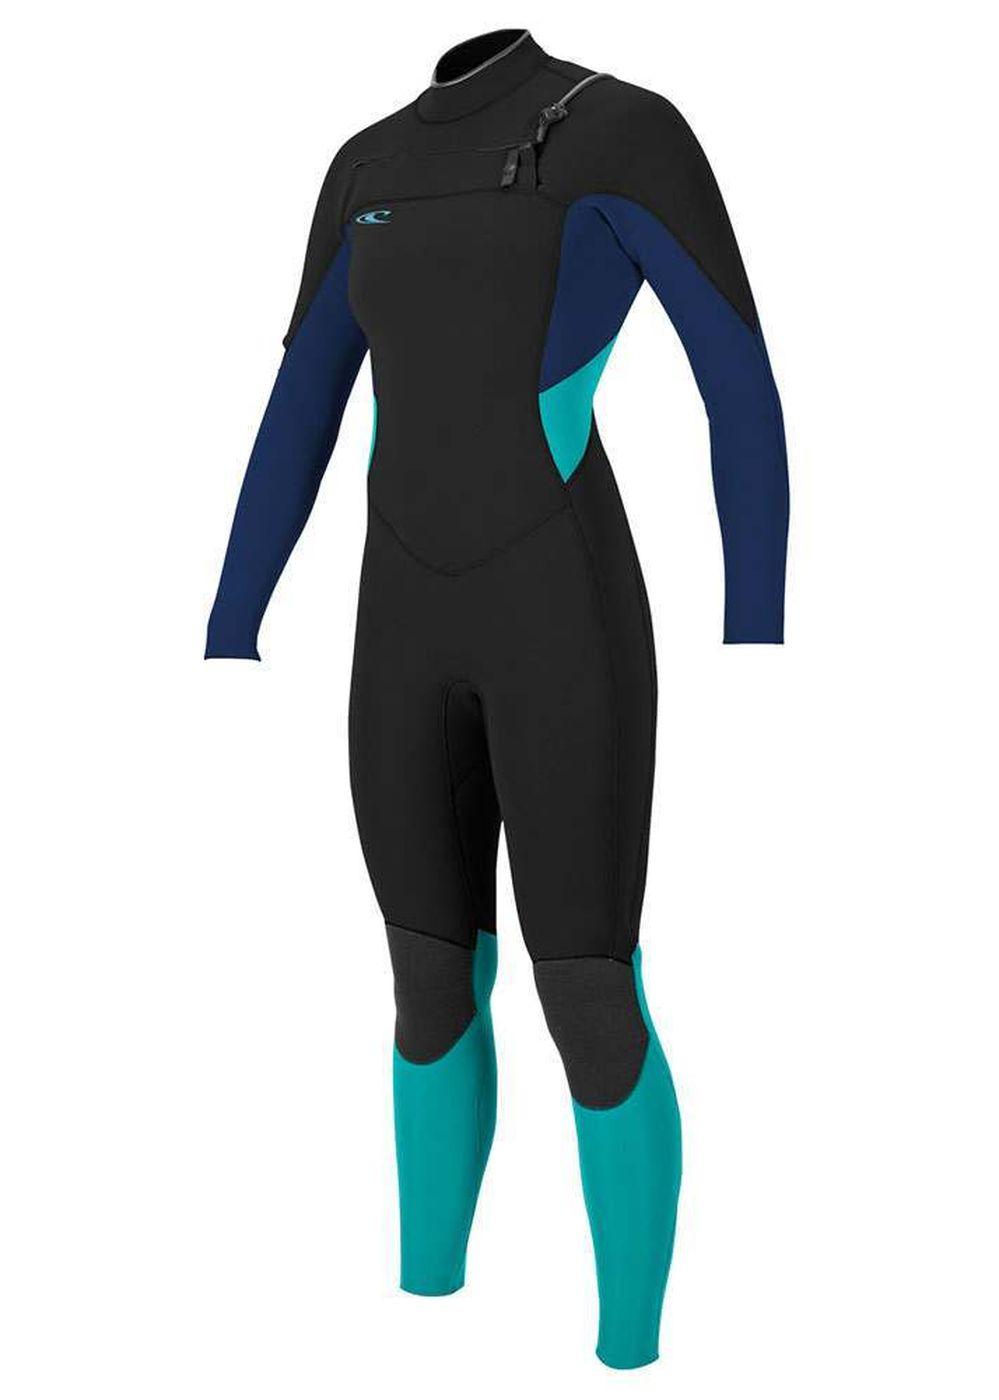 Oneill Womens Supertech Fz 3/2 Wetsuit Blk/nvy/aqu Picture